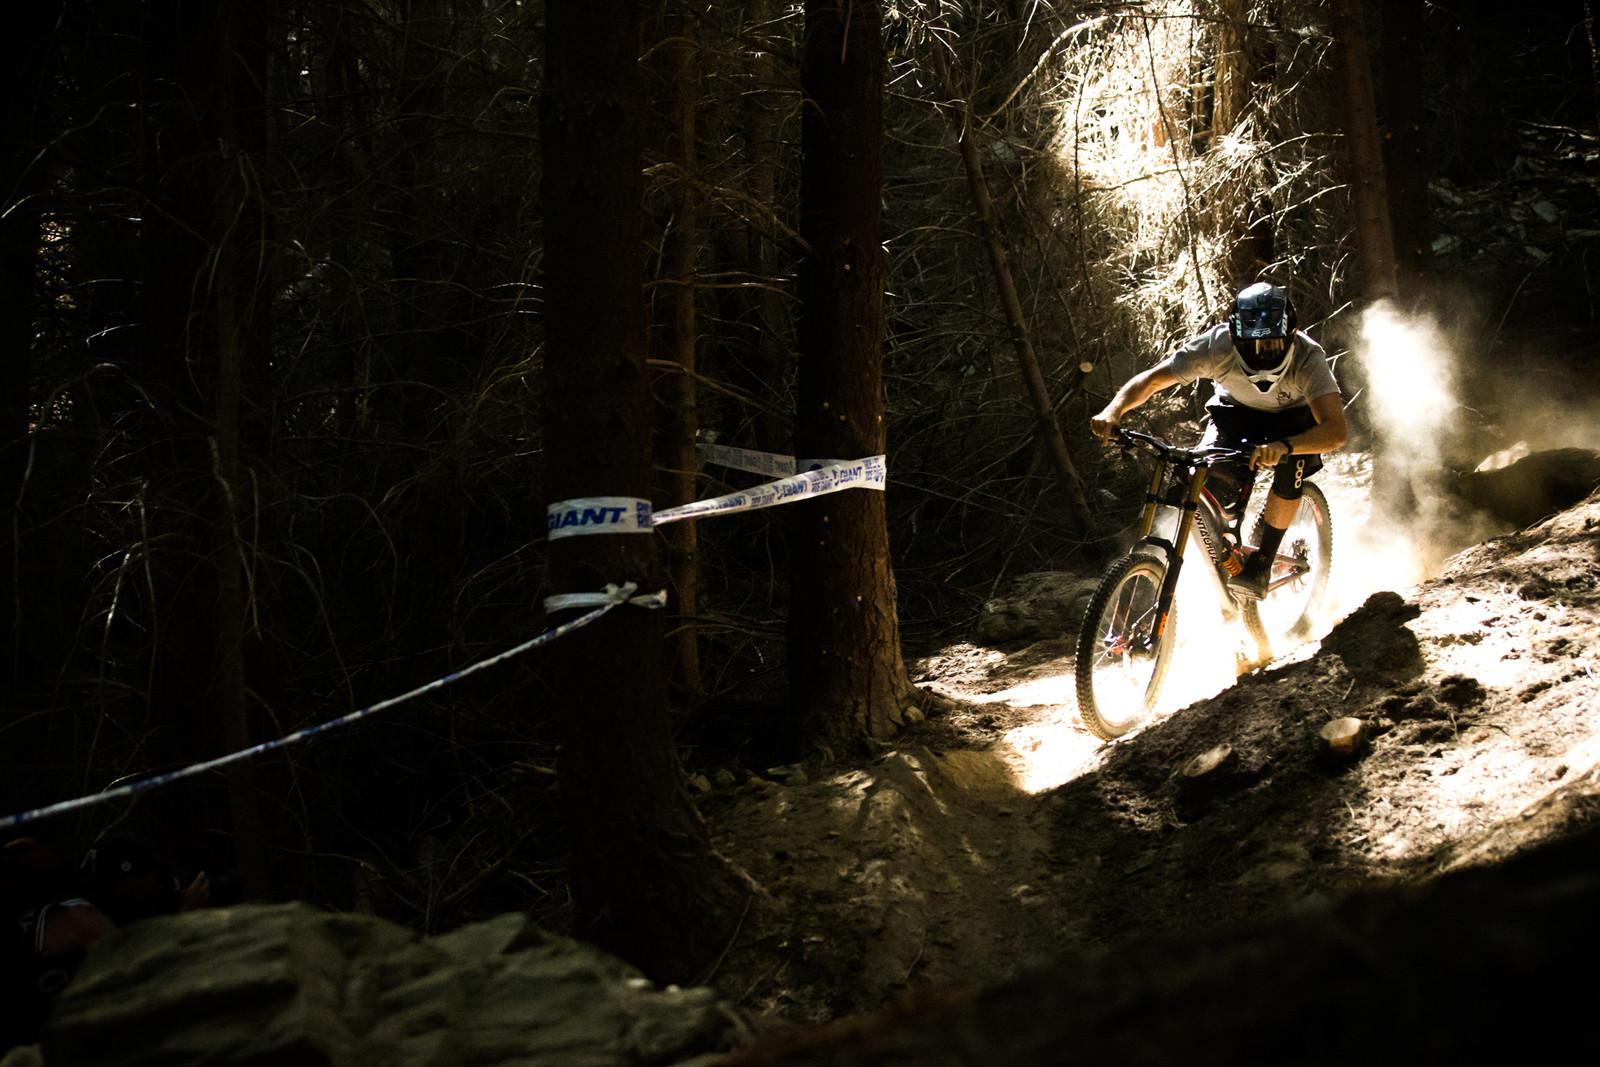 Epic Lighting - Homegrown NZ Downhill - Vertigo Bikes Ride More DH Series Race 1 - Mountain Biking Pictures - Vital MTB